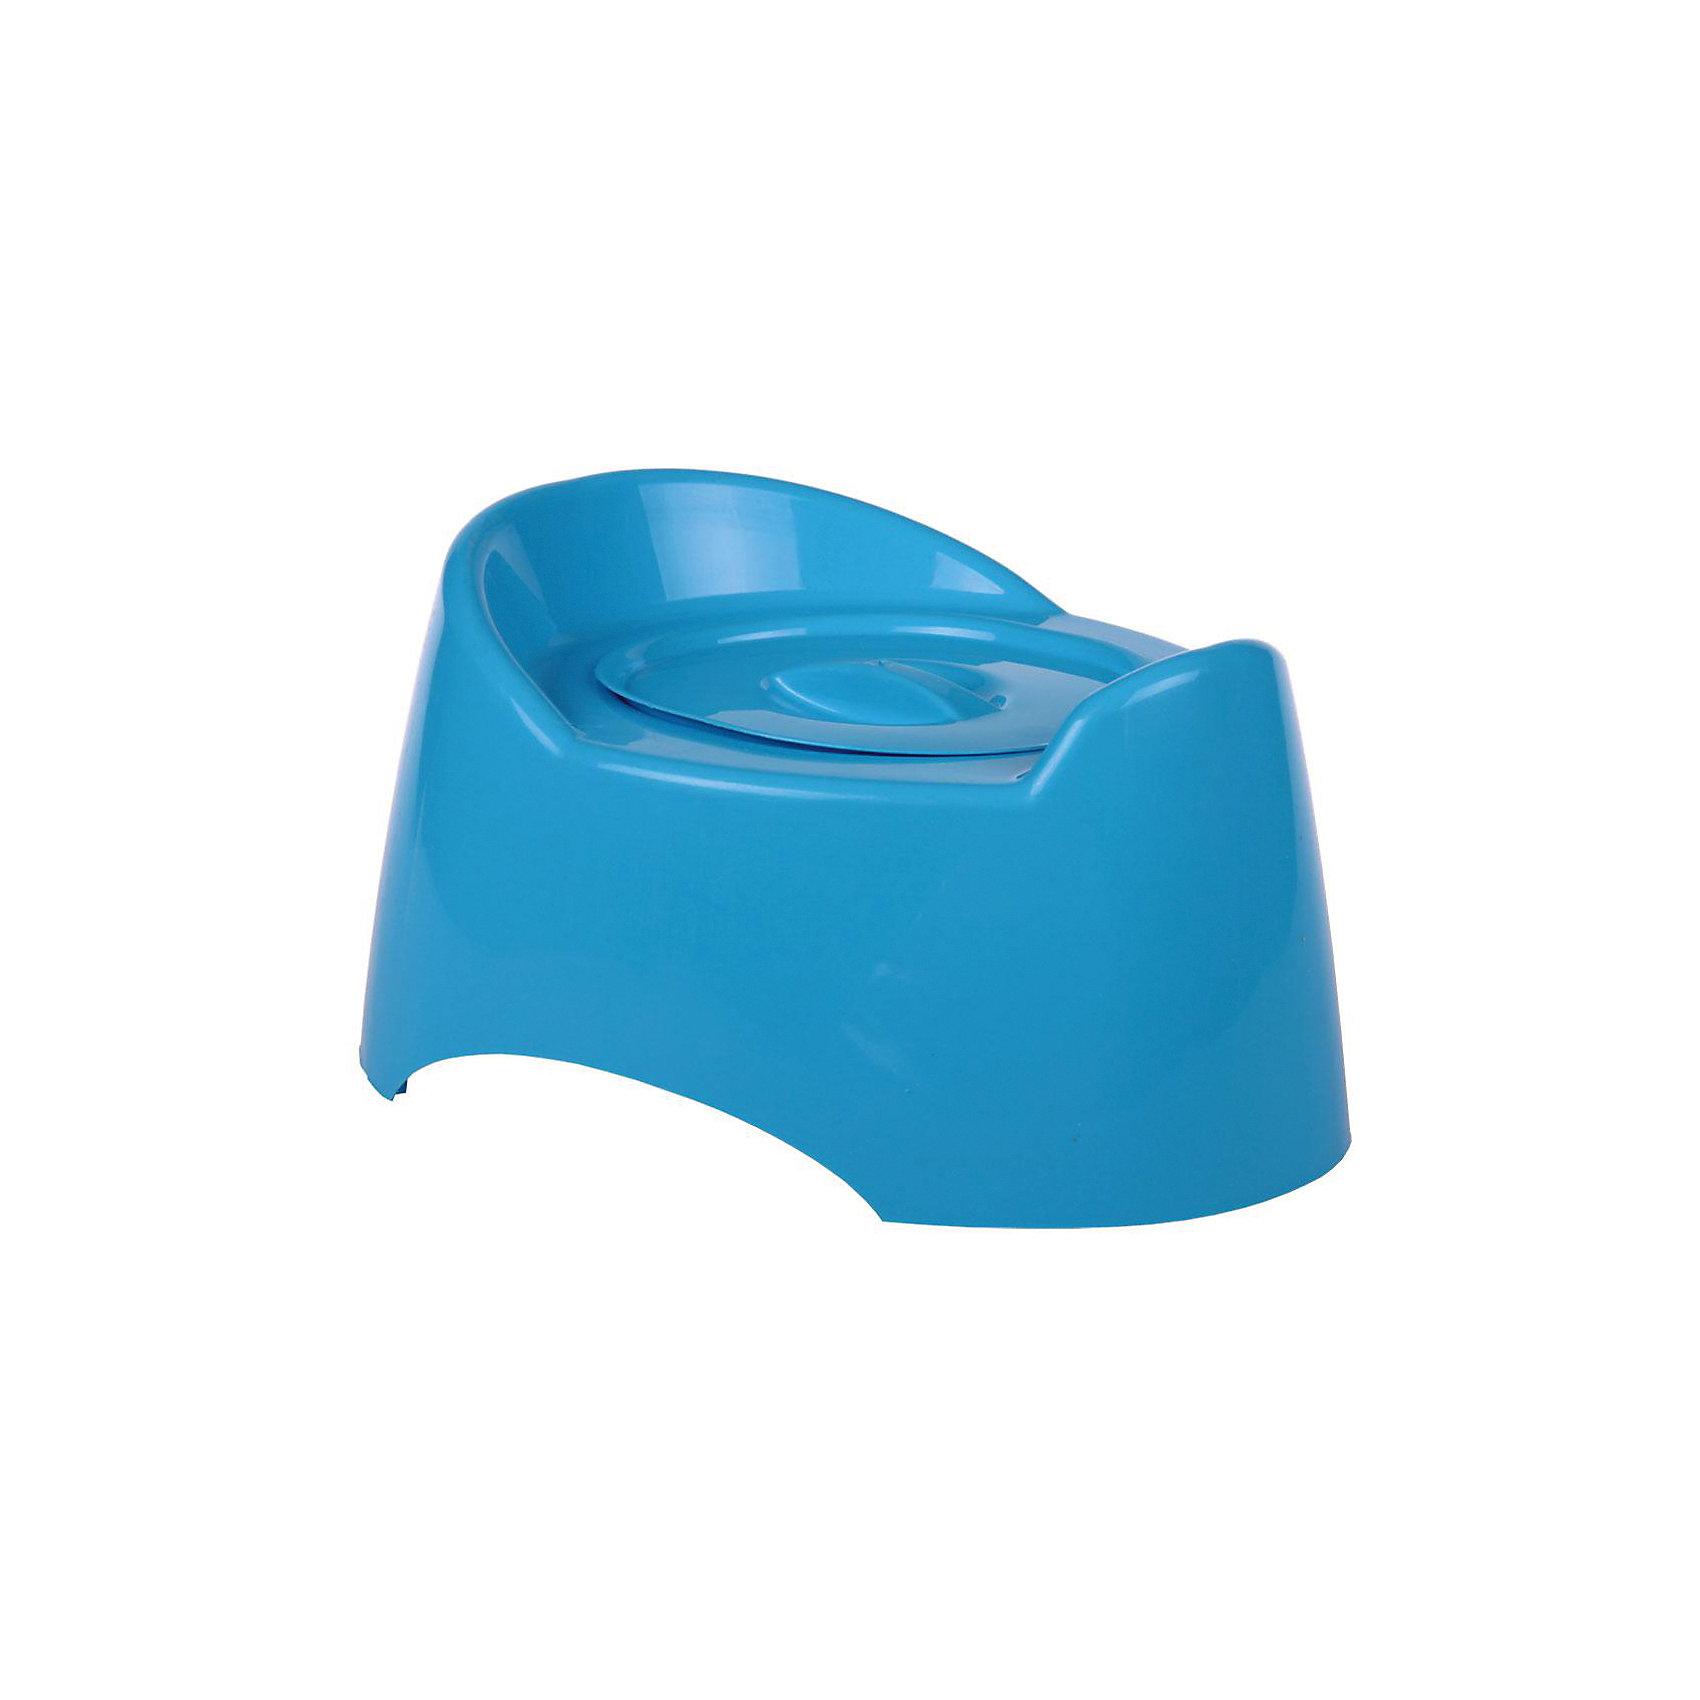 Alternativa Горшок туалетный Малышок с крыш., Alternativa, голубой